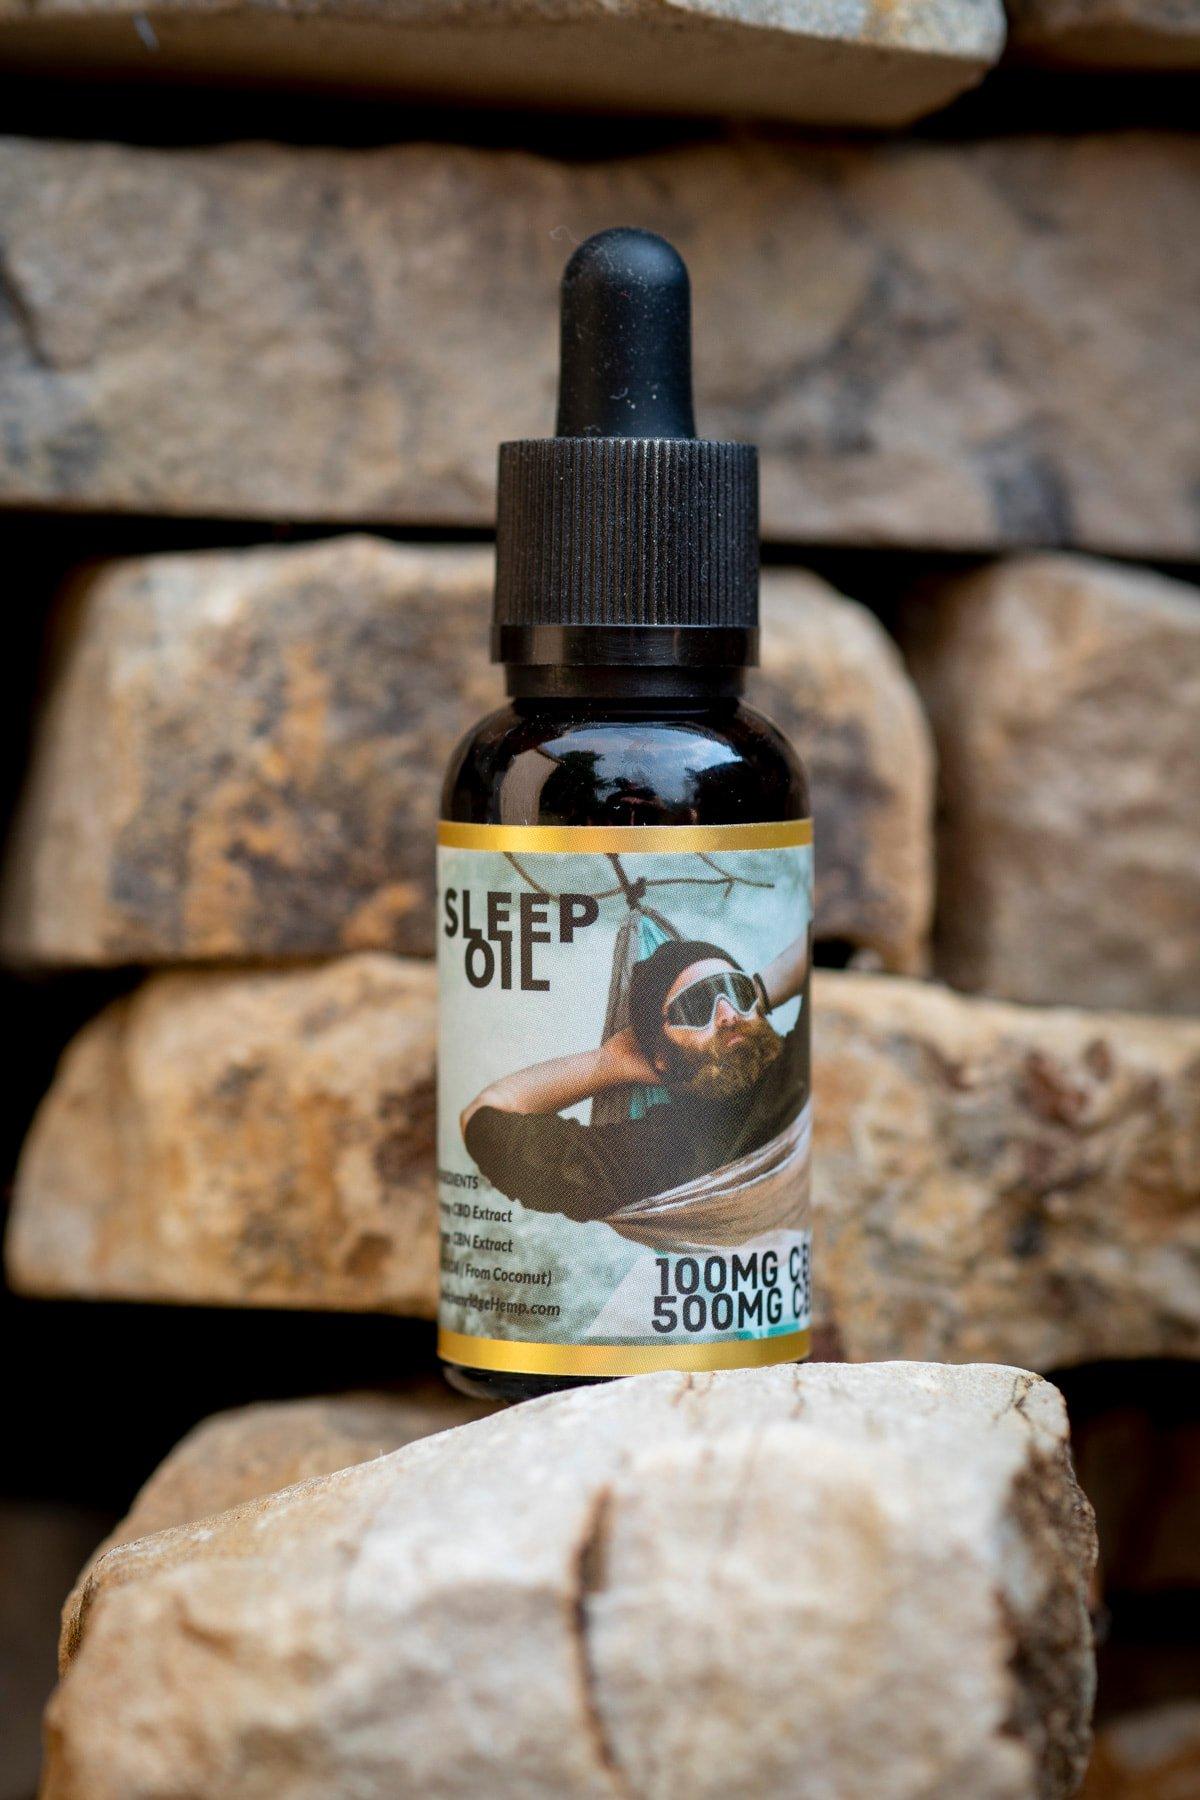 Breckenridge-500 mg CBD Sleep Oil